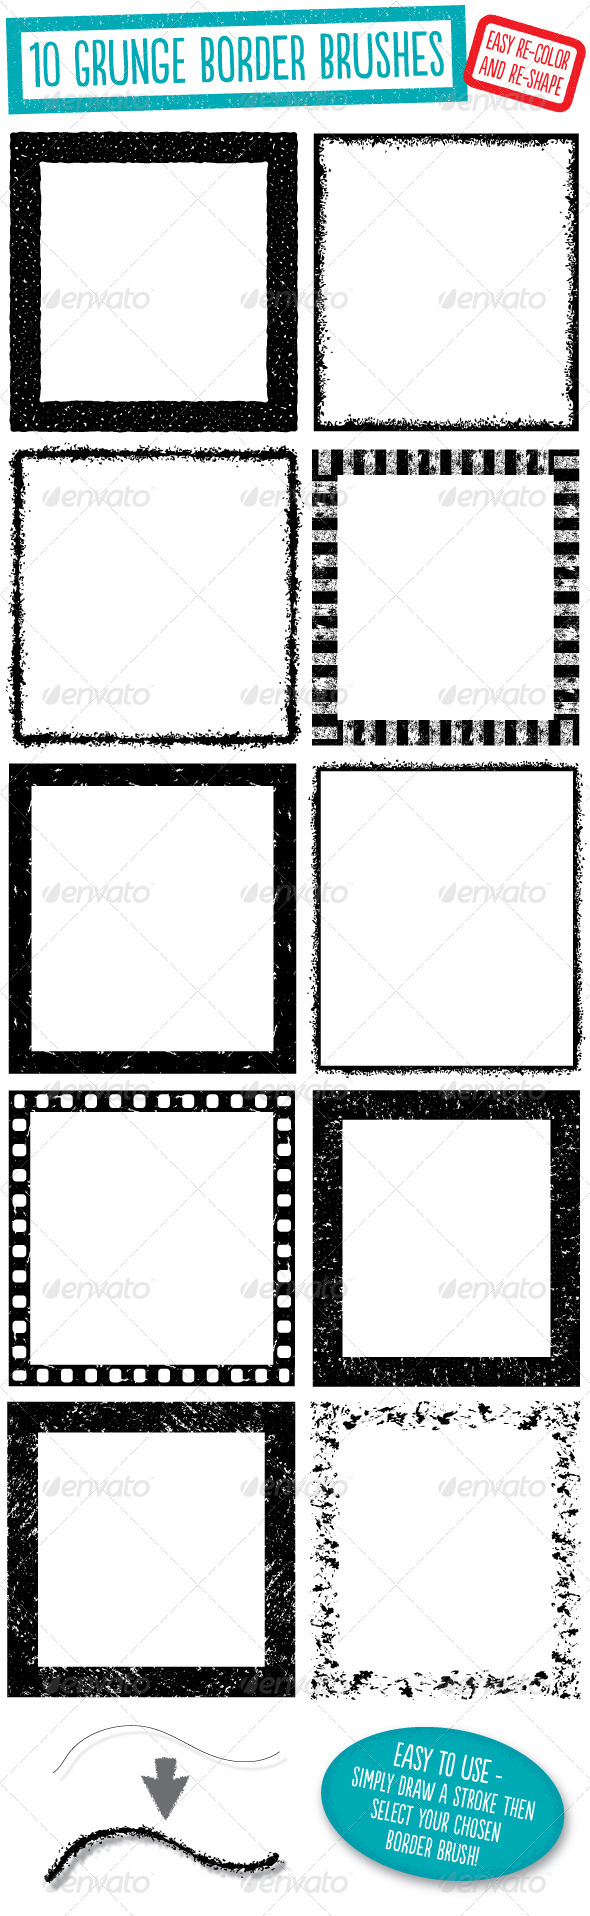 GraphicRiver Grunge Border Brushes 6048162